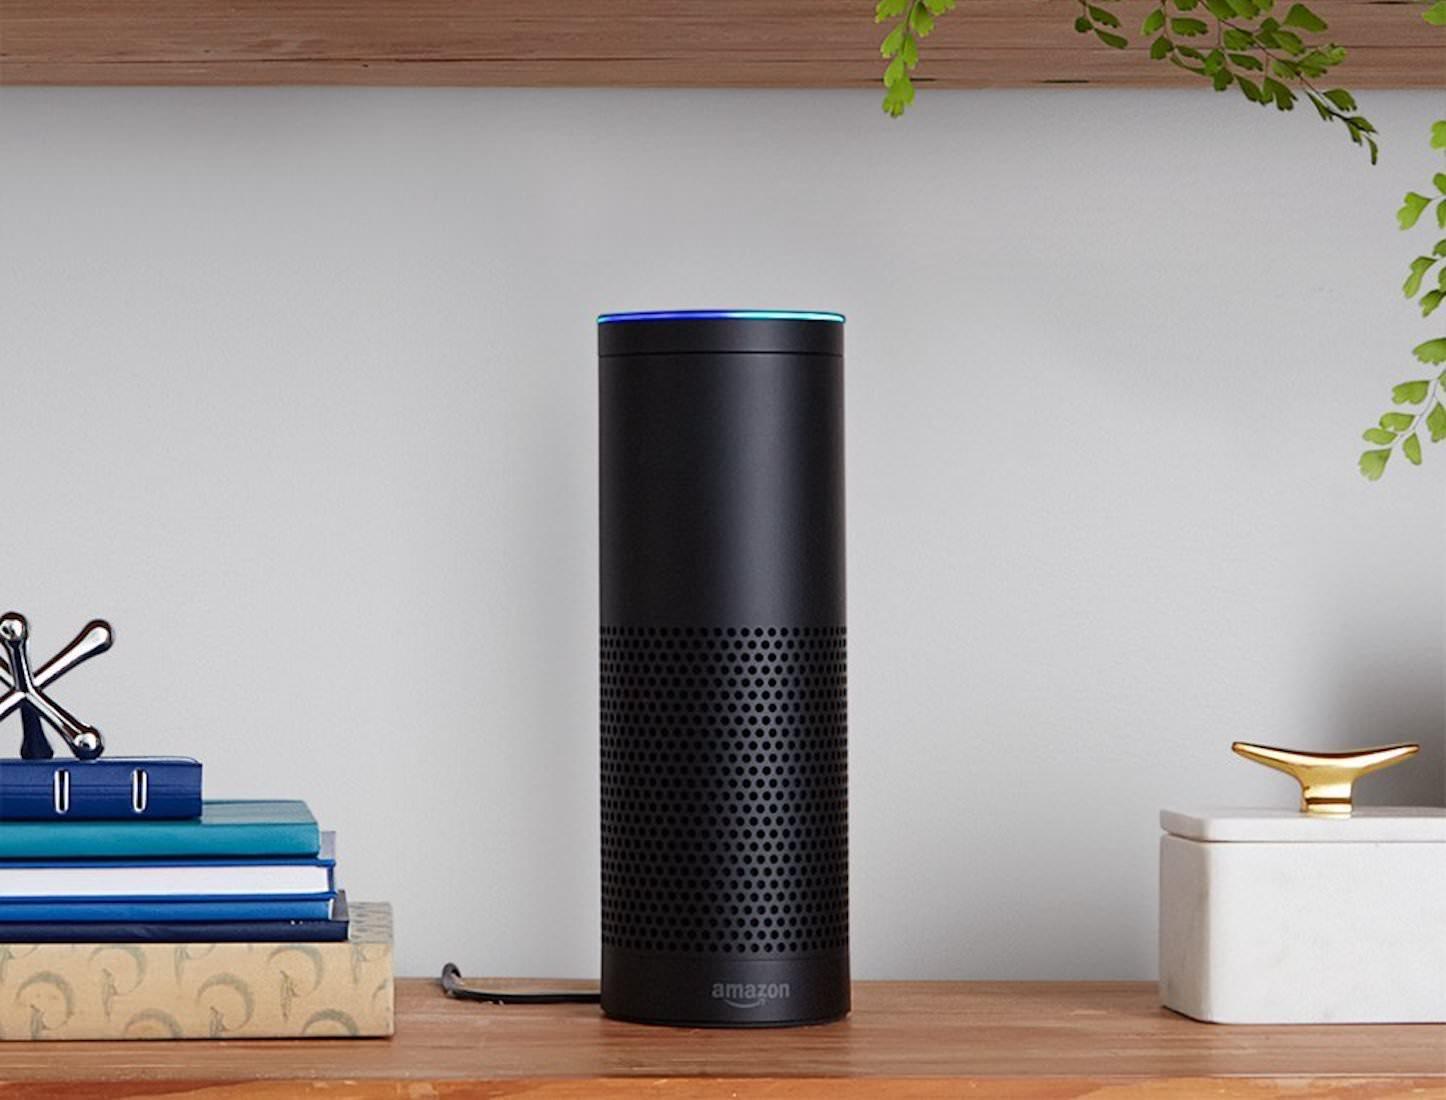 Alexa-Amazon-Echo-Coming-to-Japan.jpg